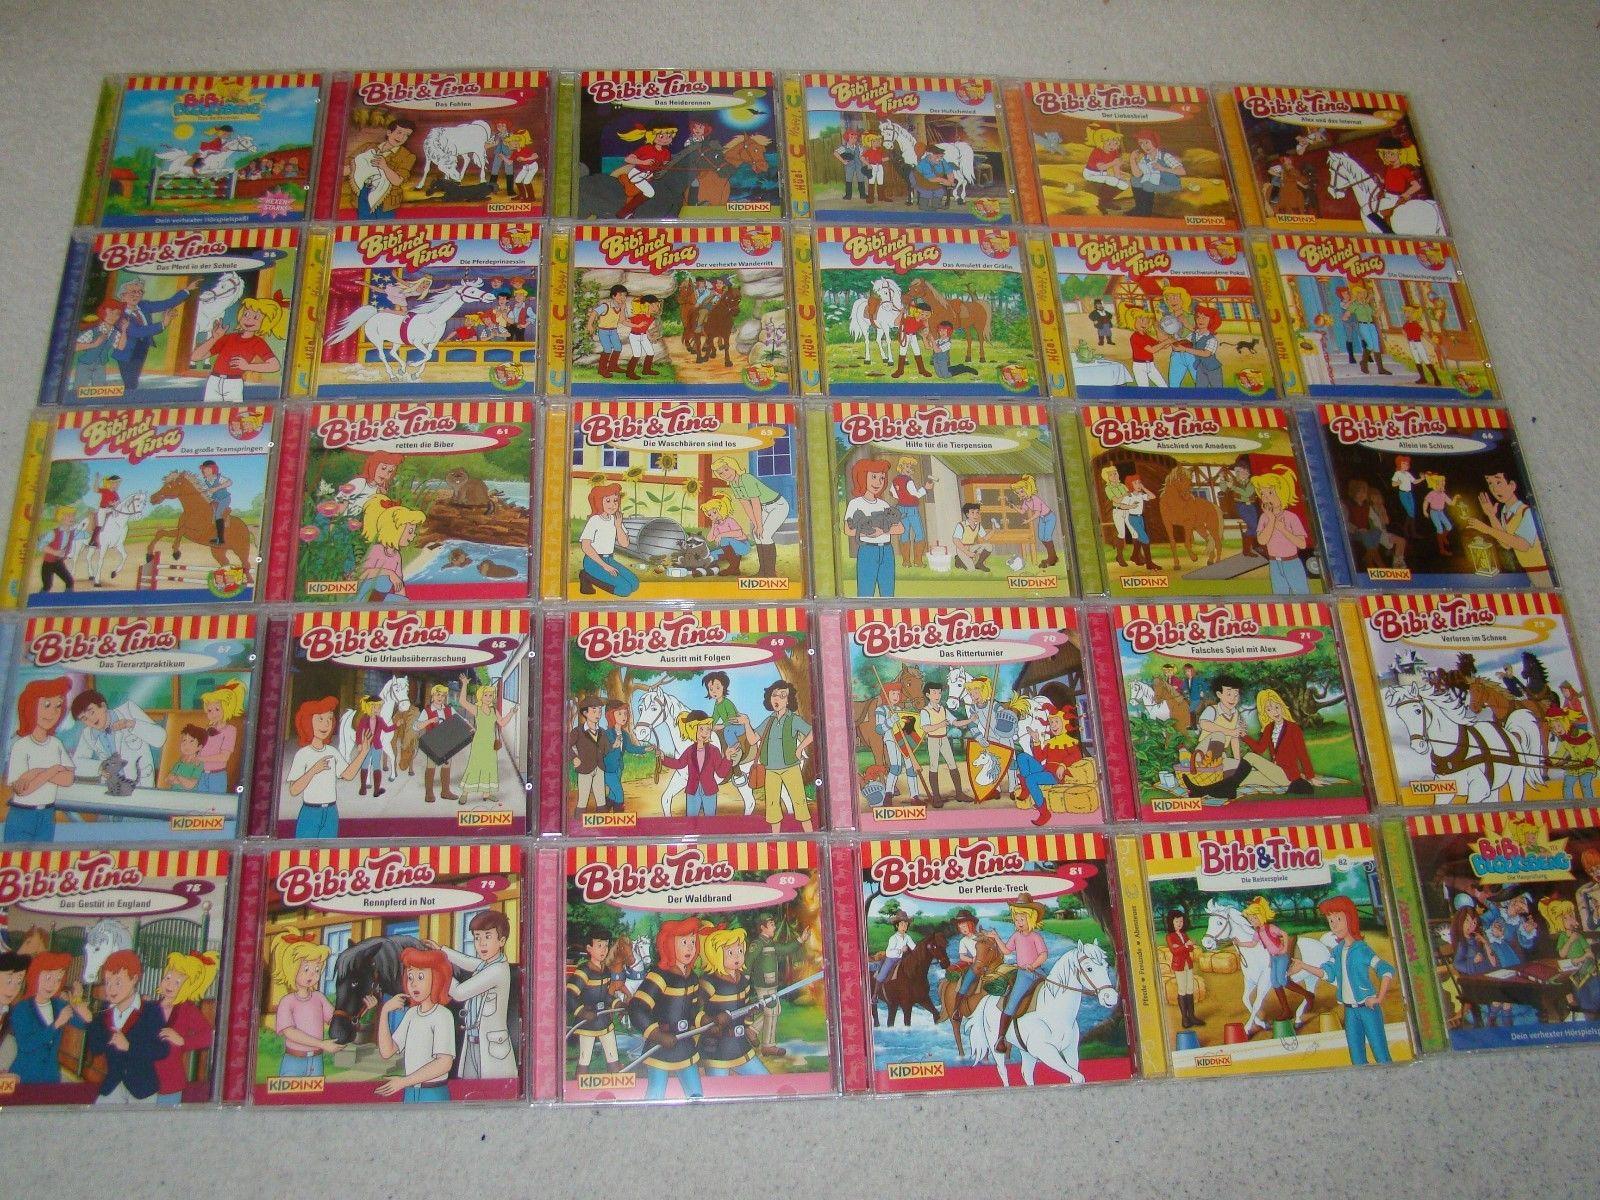 Bibi und Tina - CD Sammlung